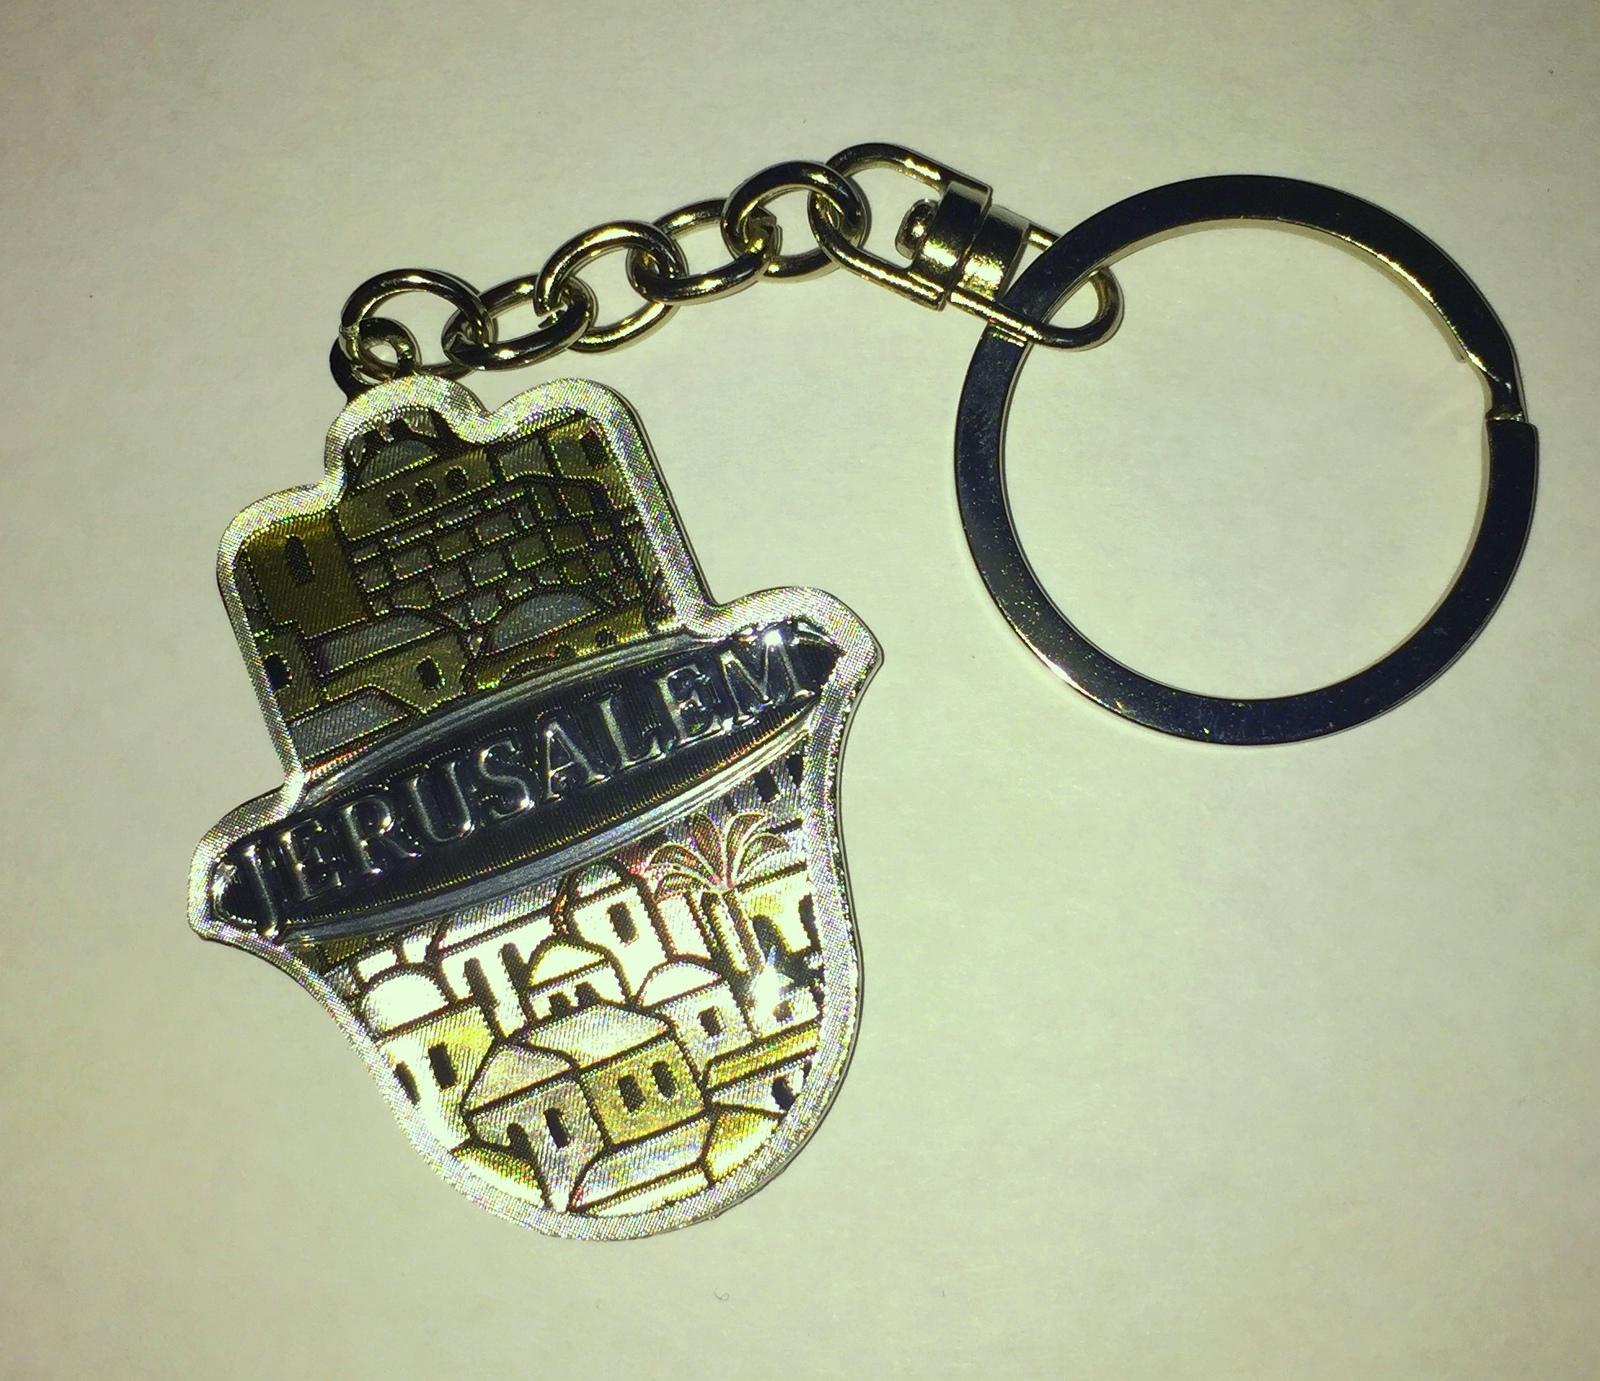 Judaica Keyring Keychain Key Charm Holder Hamsa Metal Epoxy Brown Jerusalem View